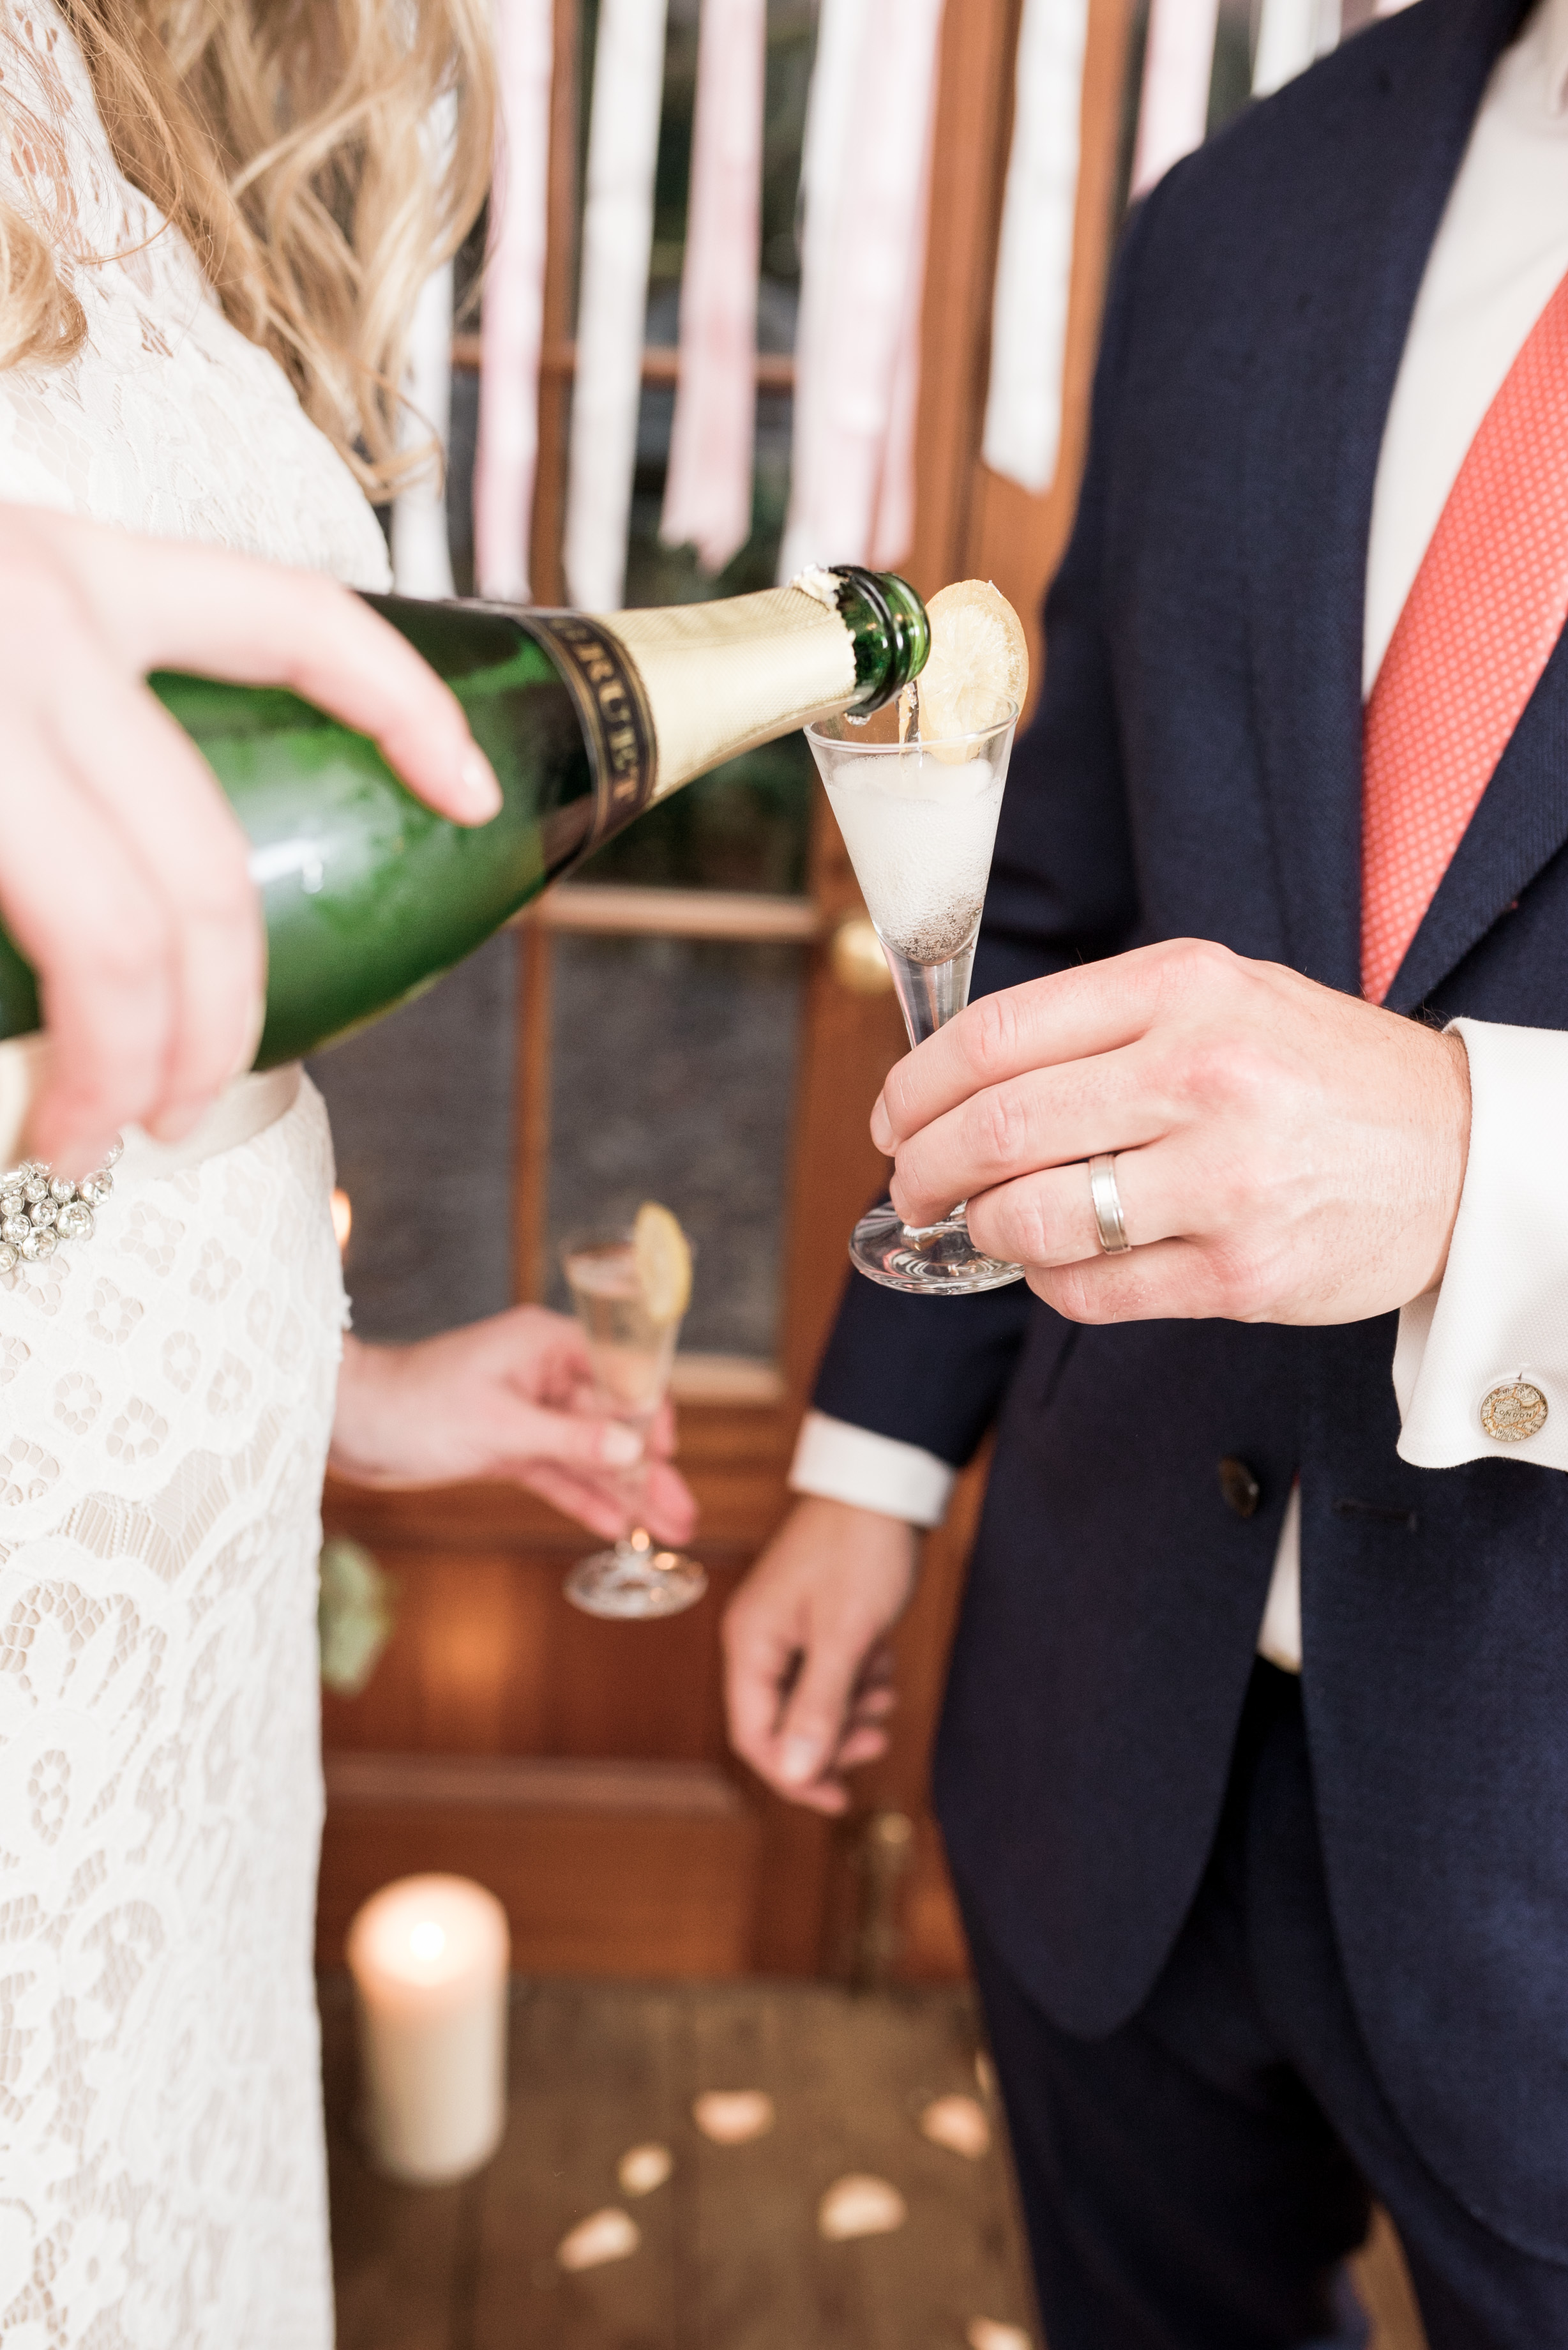 charleston elopement planners, scarlet plan & design, coral, tangerine, hot pink, peach intimate wedding (94).jpg